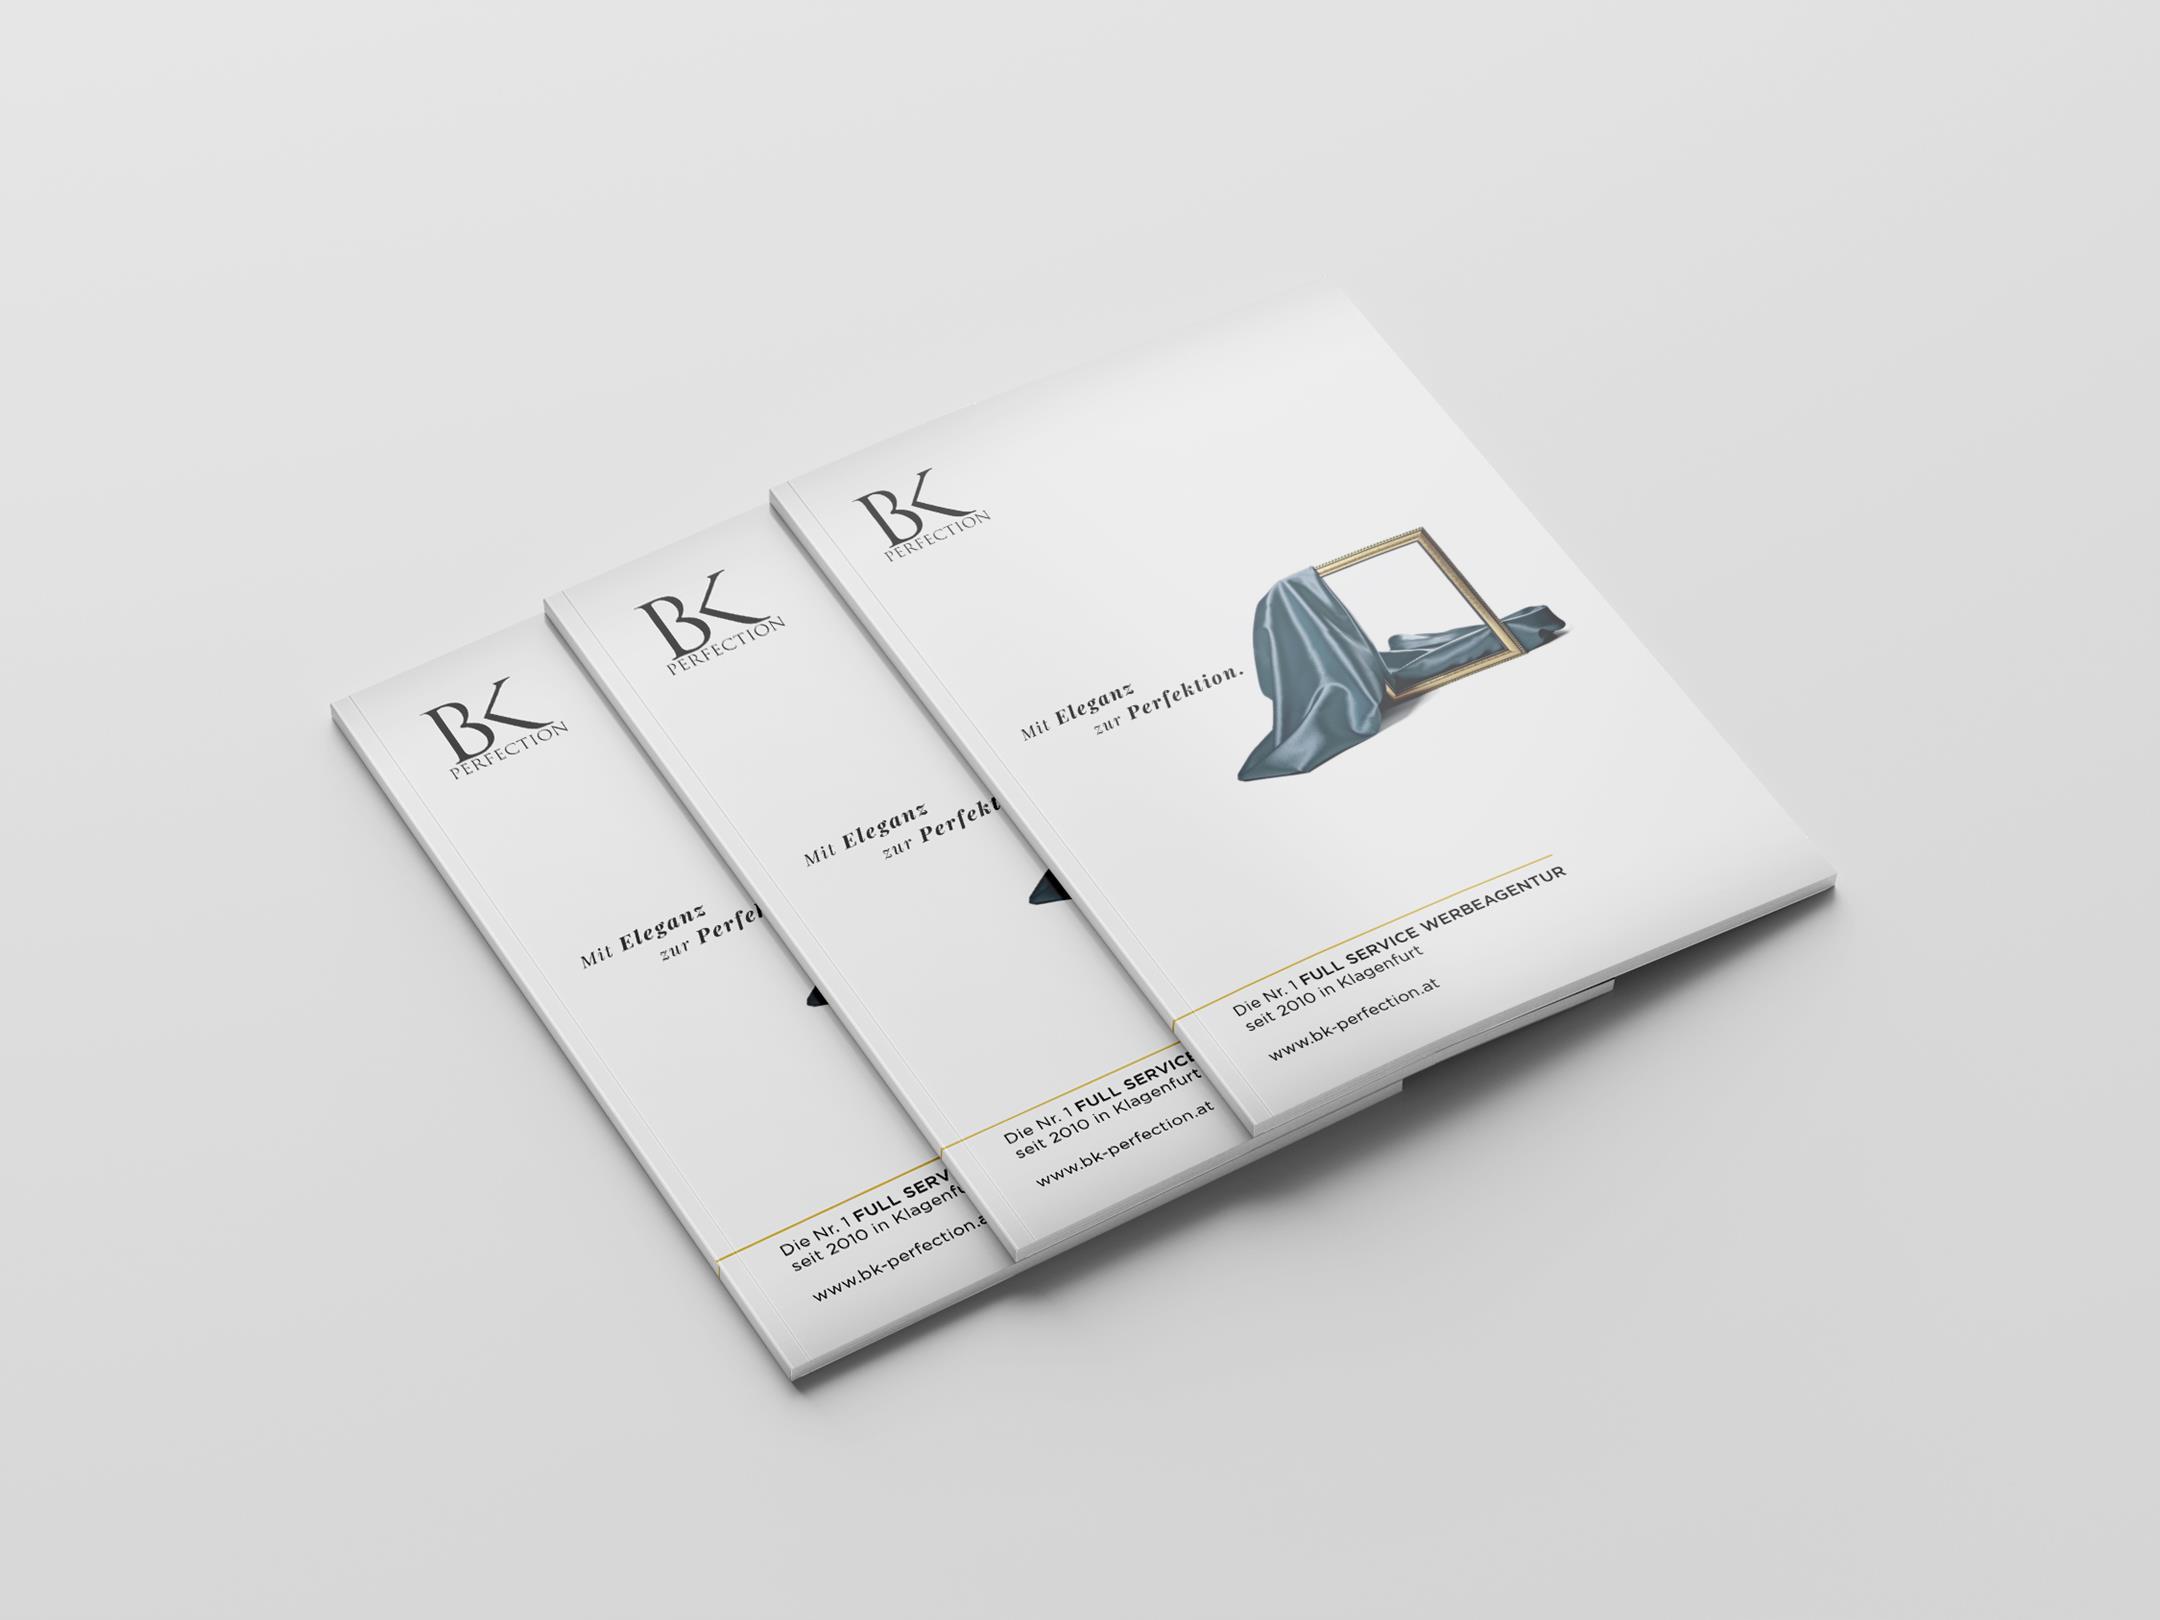 -bk-perfection-broschüre-mockup-62160×1620